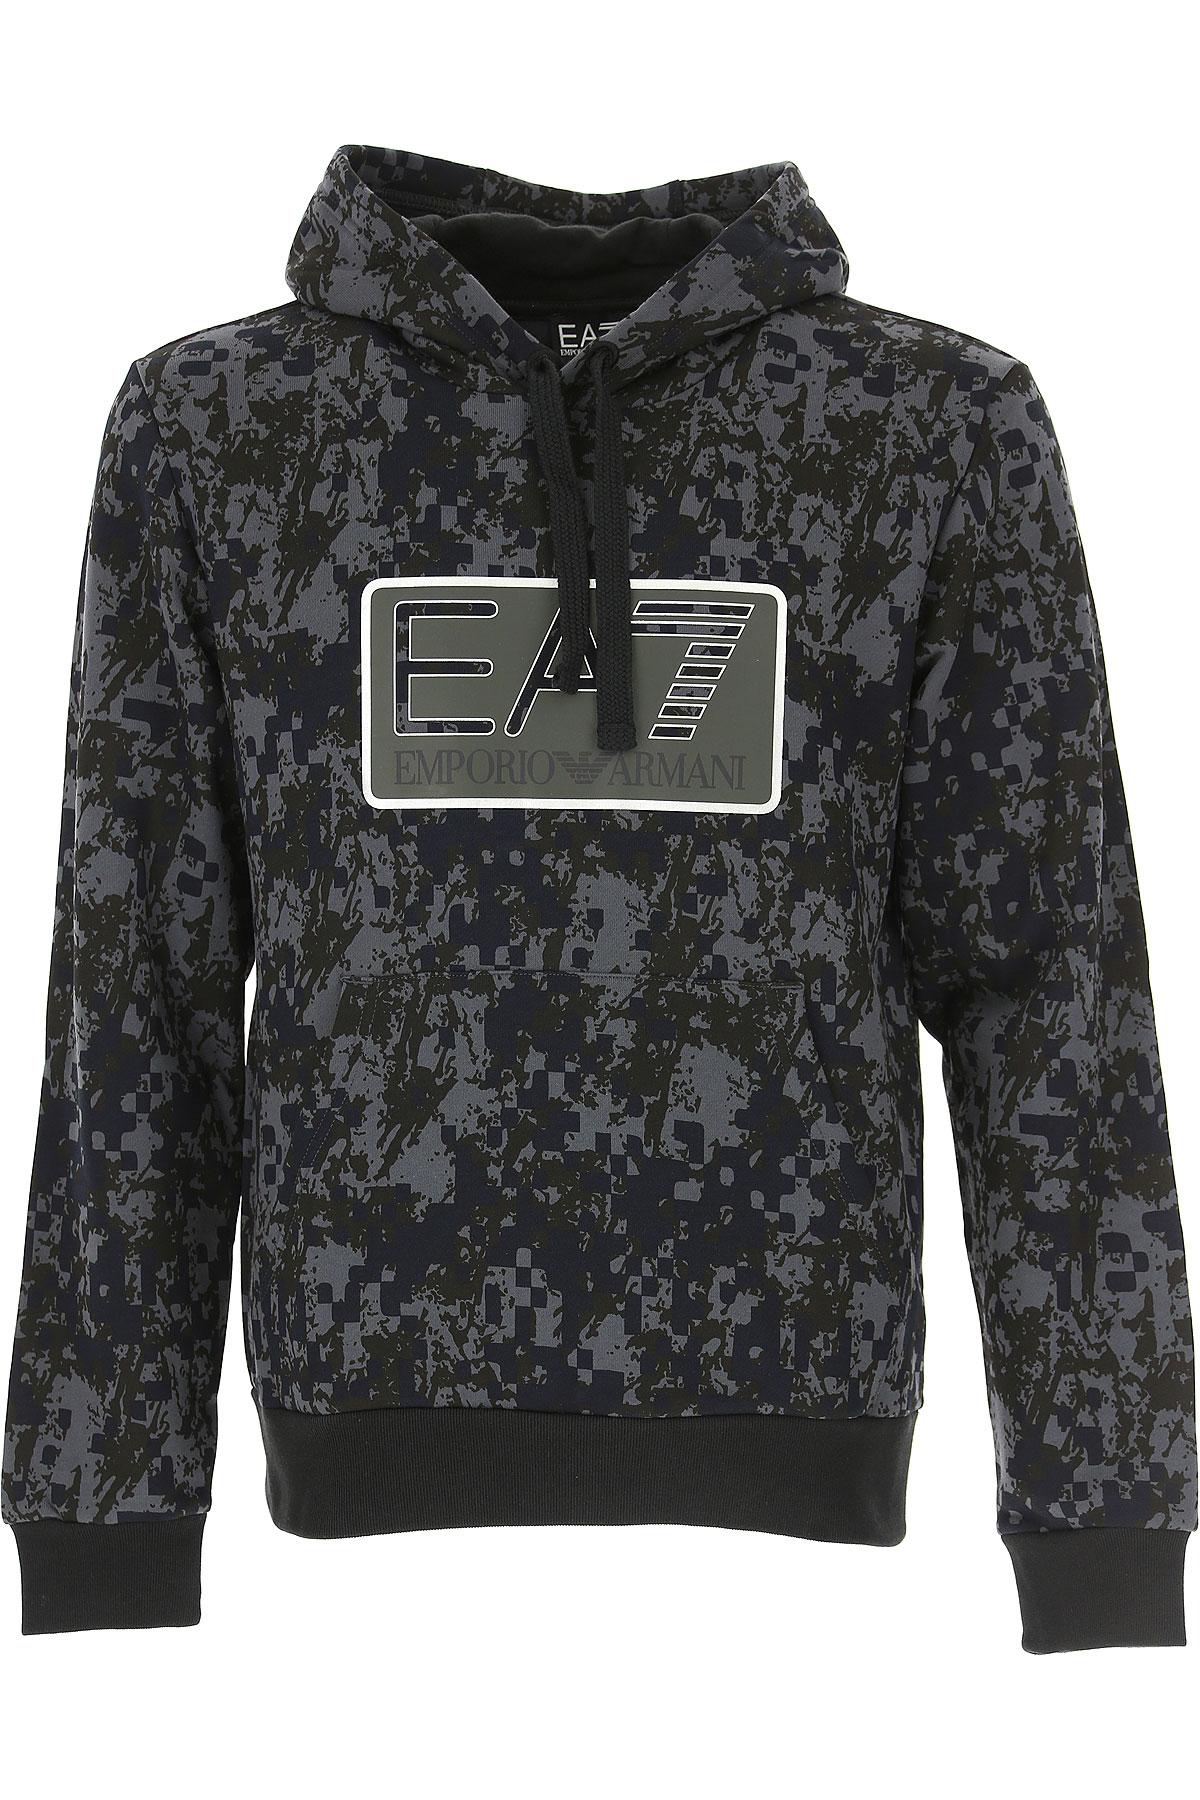 Emporio Armani Sweatshirt for Men, Black, Cotton, 2017, L M S XL USA-484356